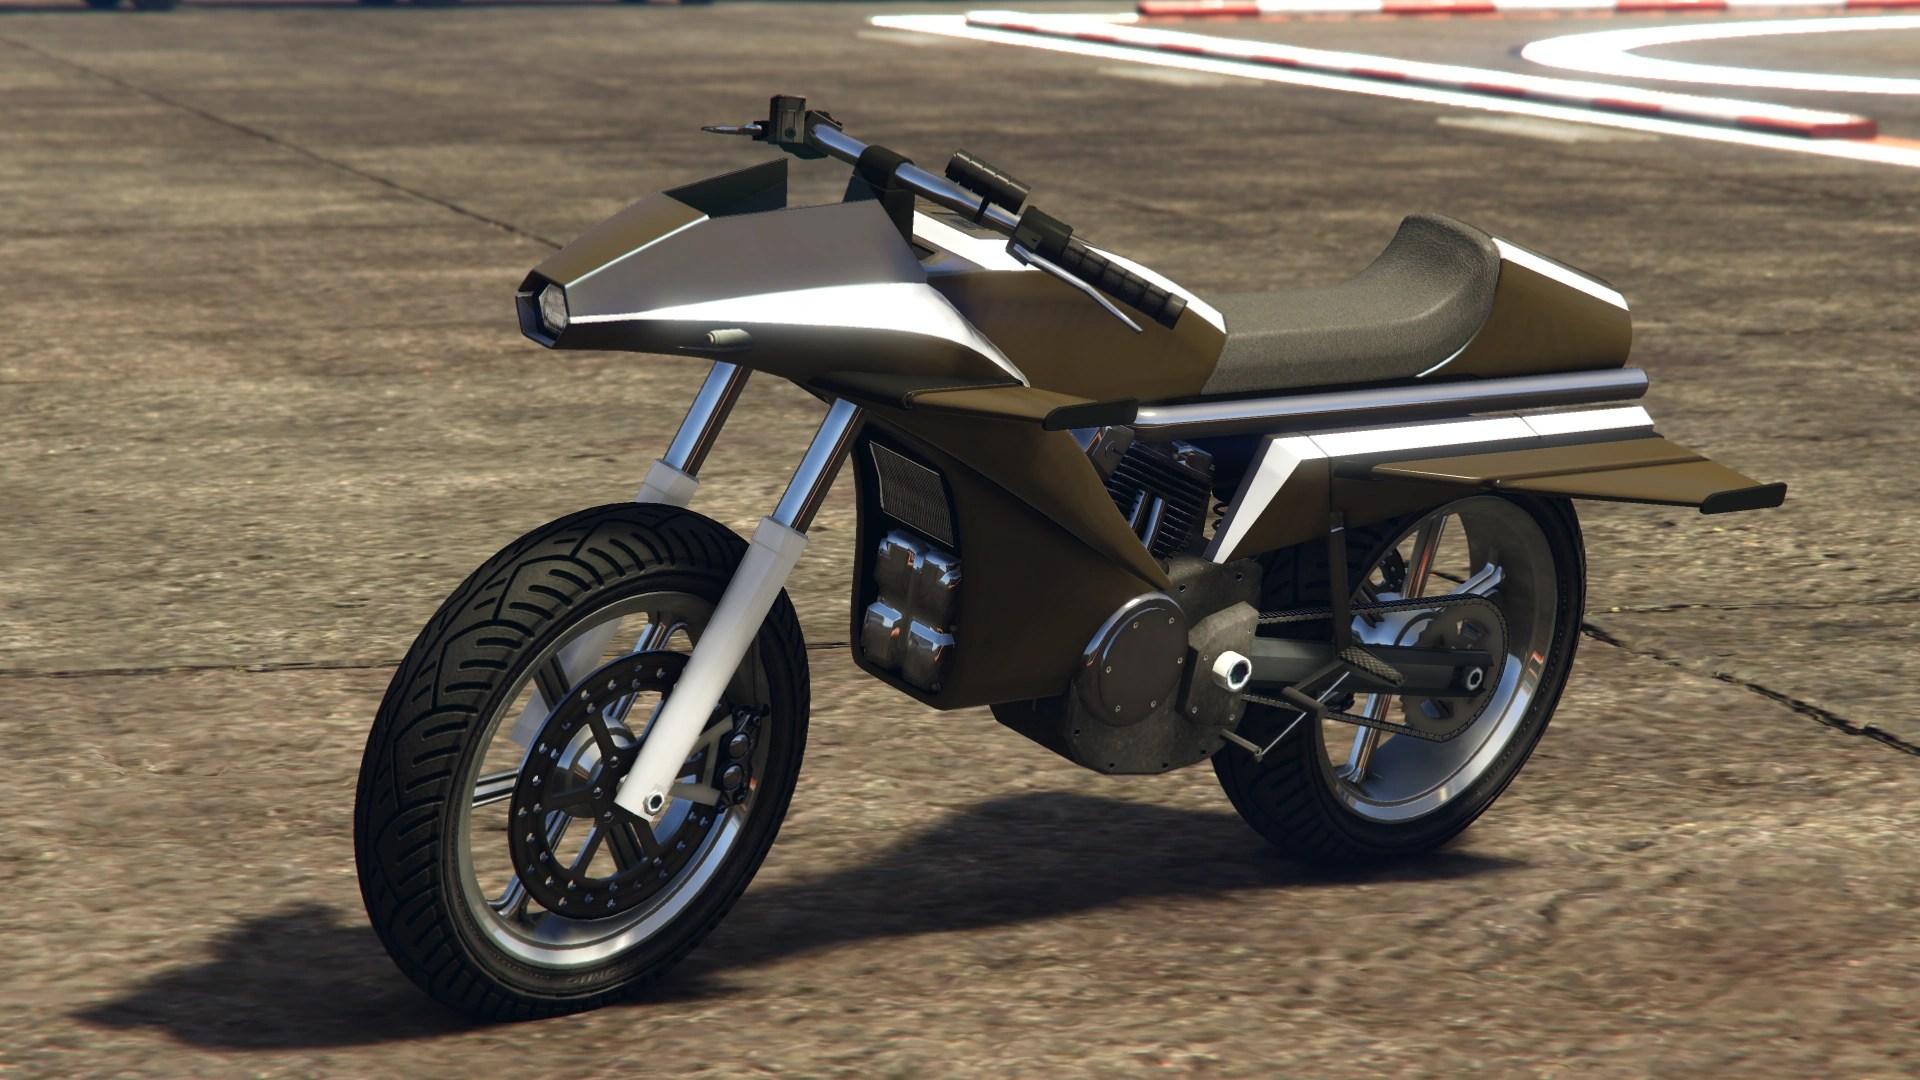 Grand Theft Auto 5 Car Wallpaper Oppressor Gta Wiki Fandom Powered By Wikia